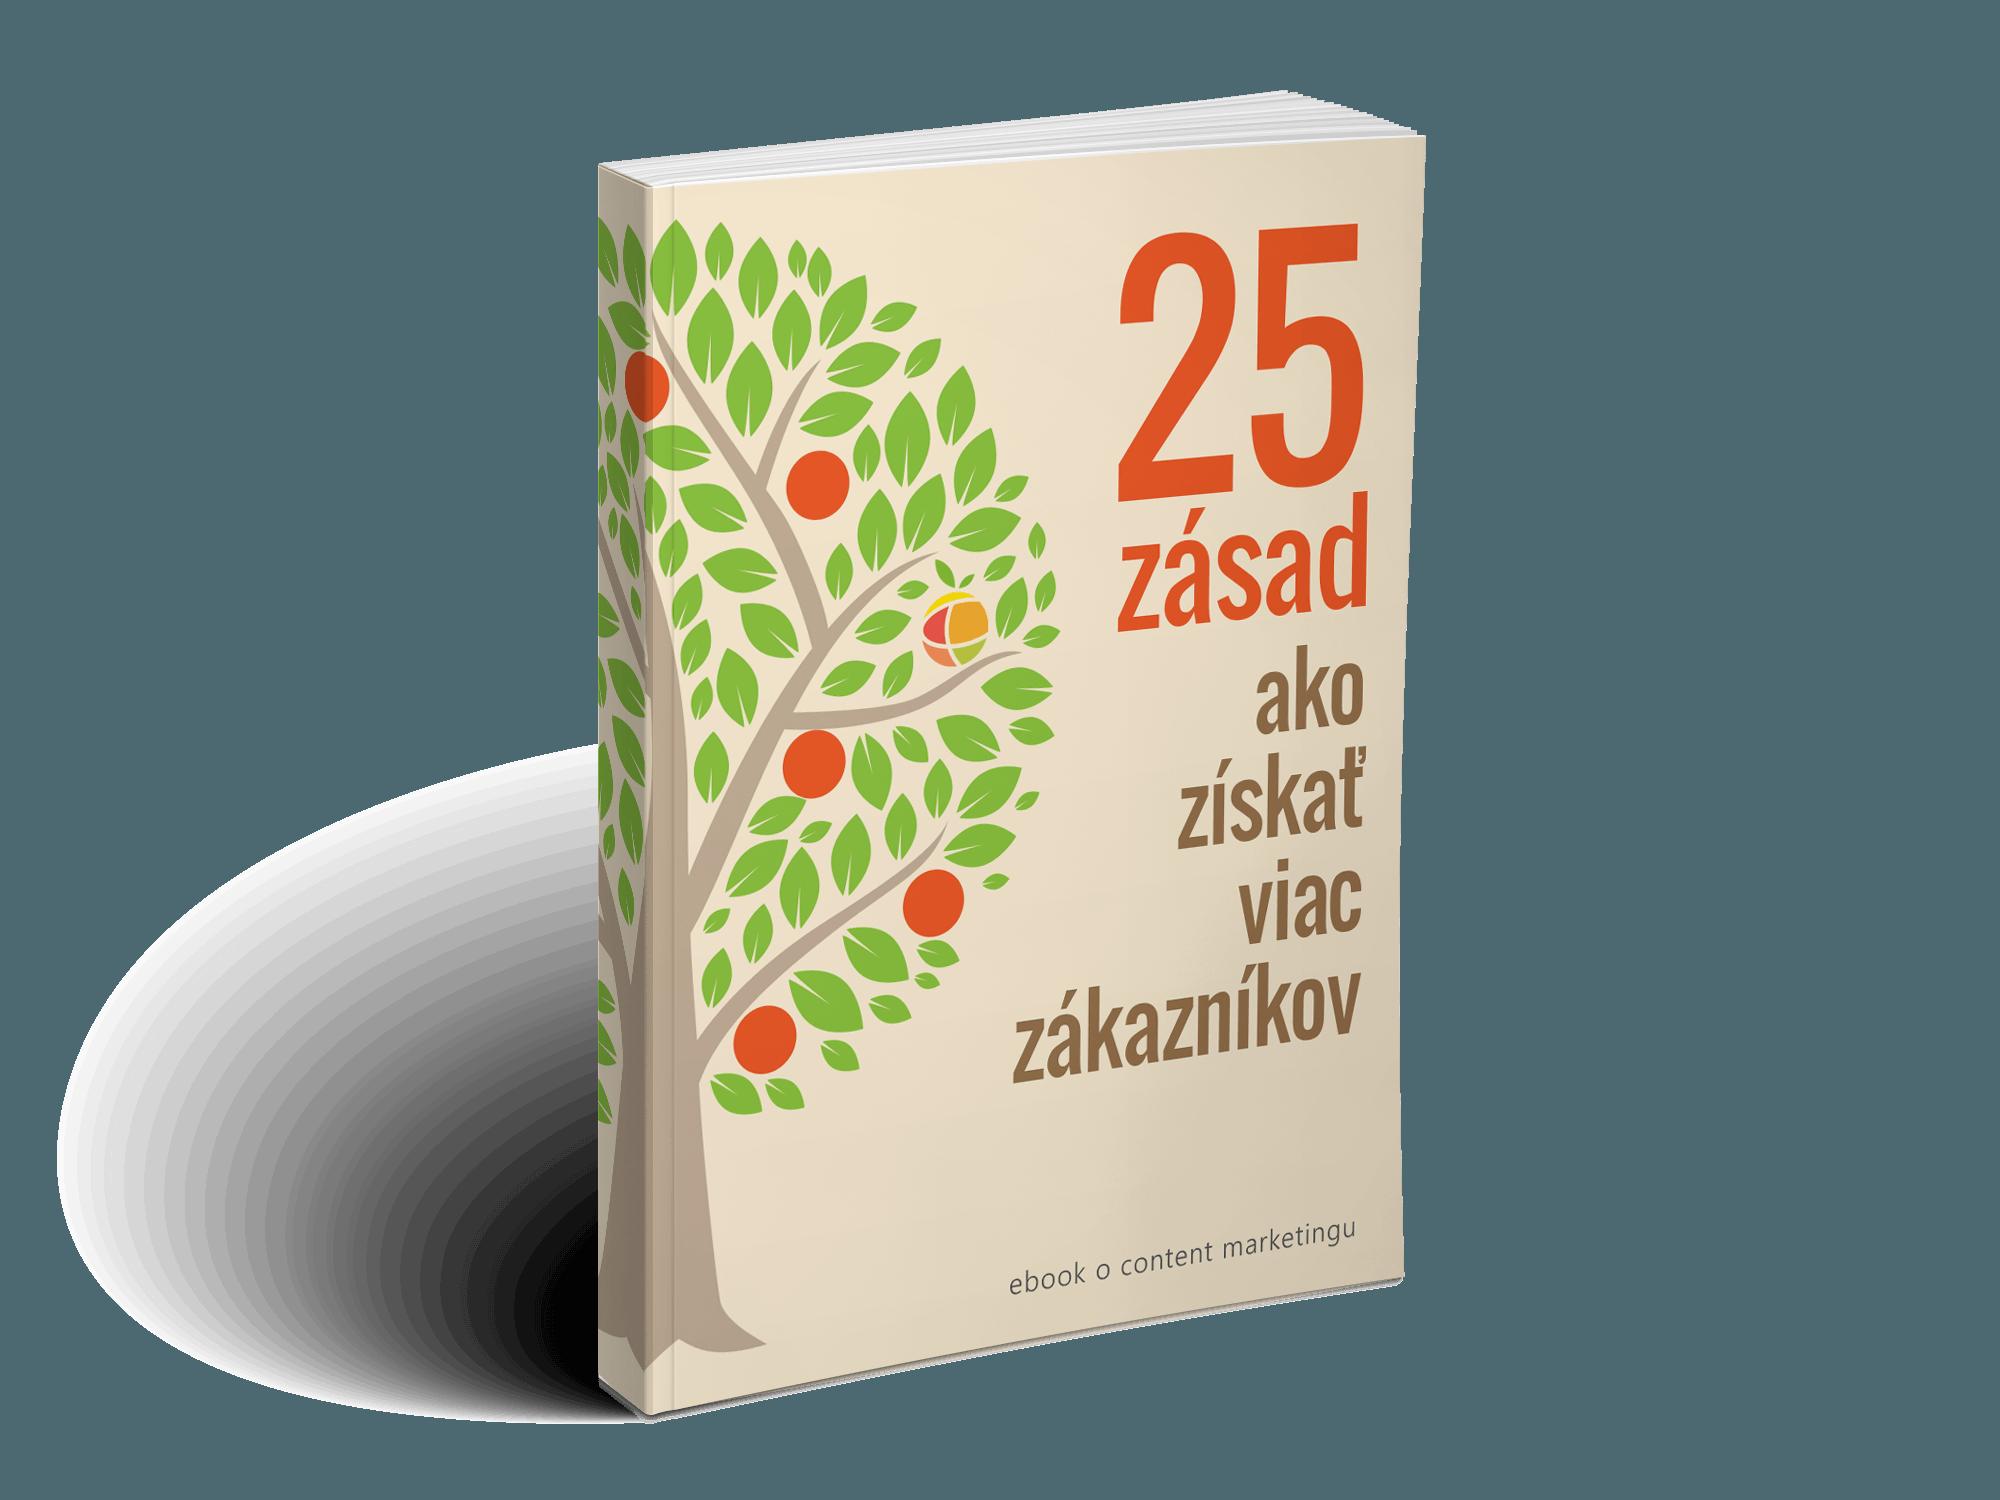 Ebook-25-zasad-ako-ziskat-viac-zakaznikov-ContentFruiter